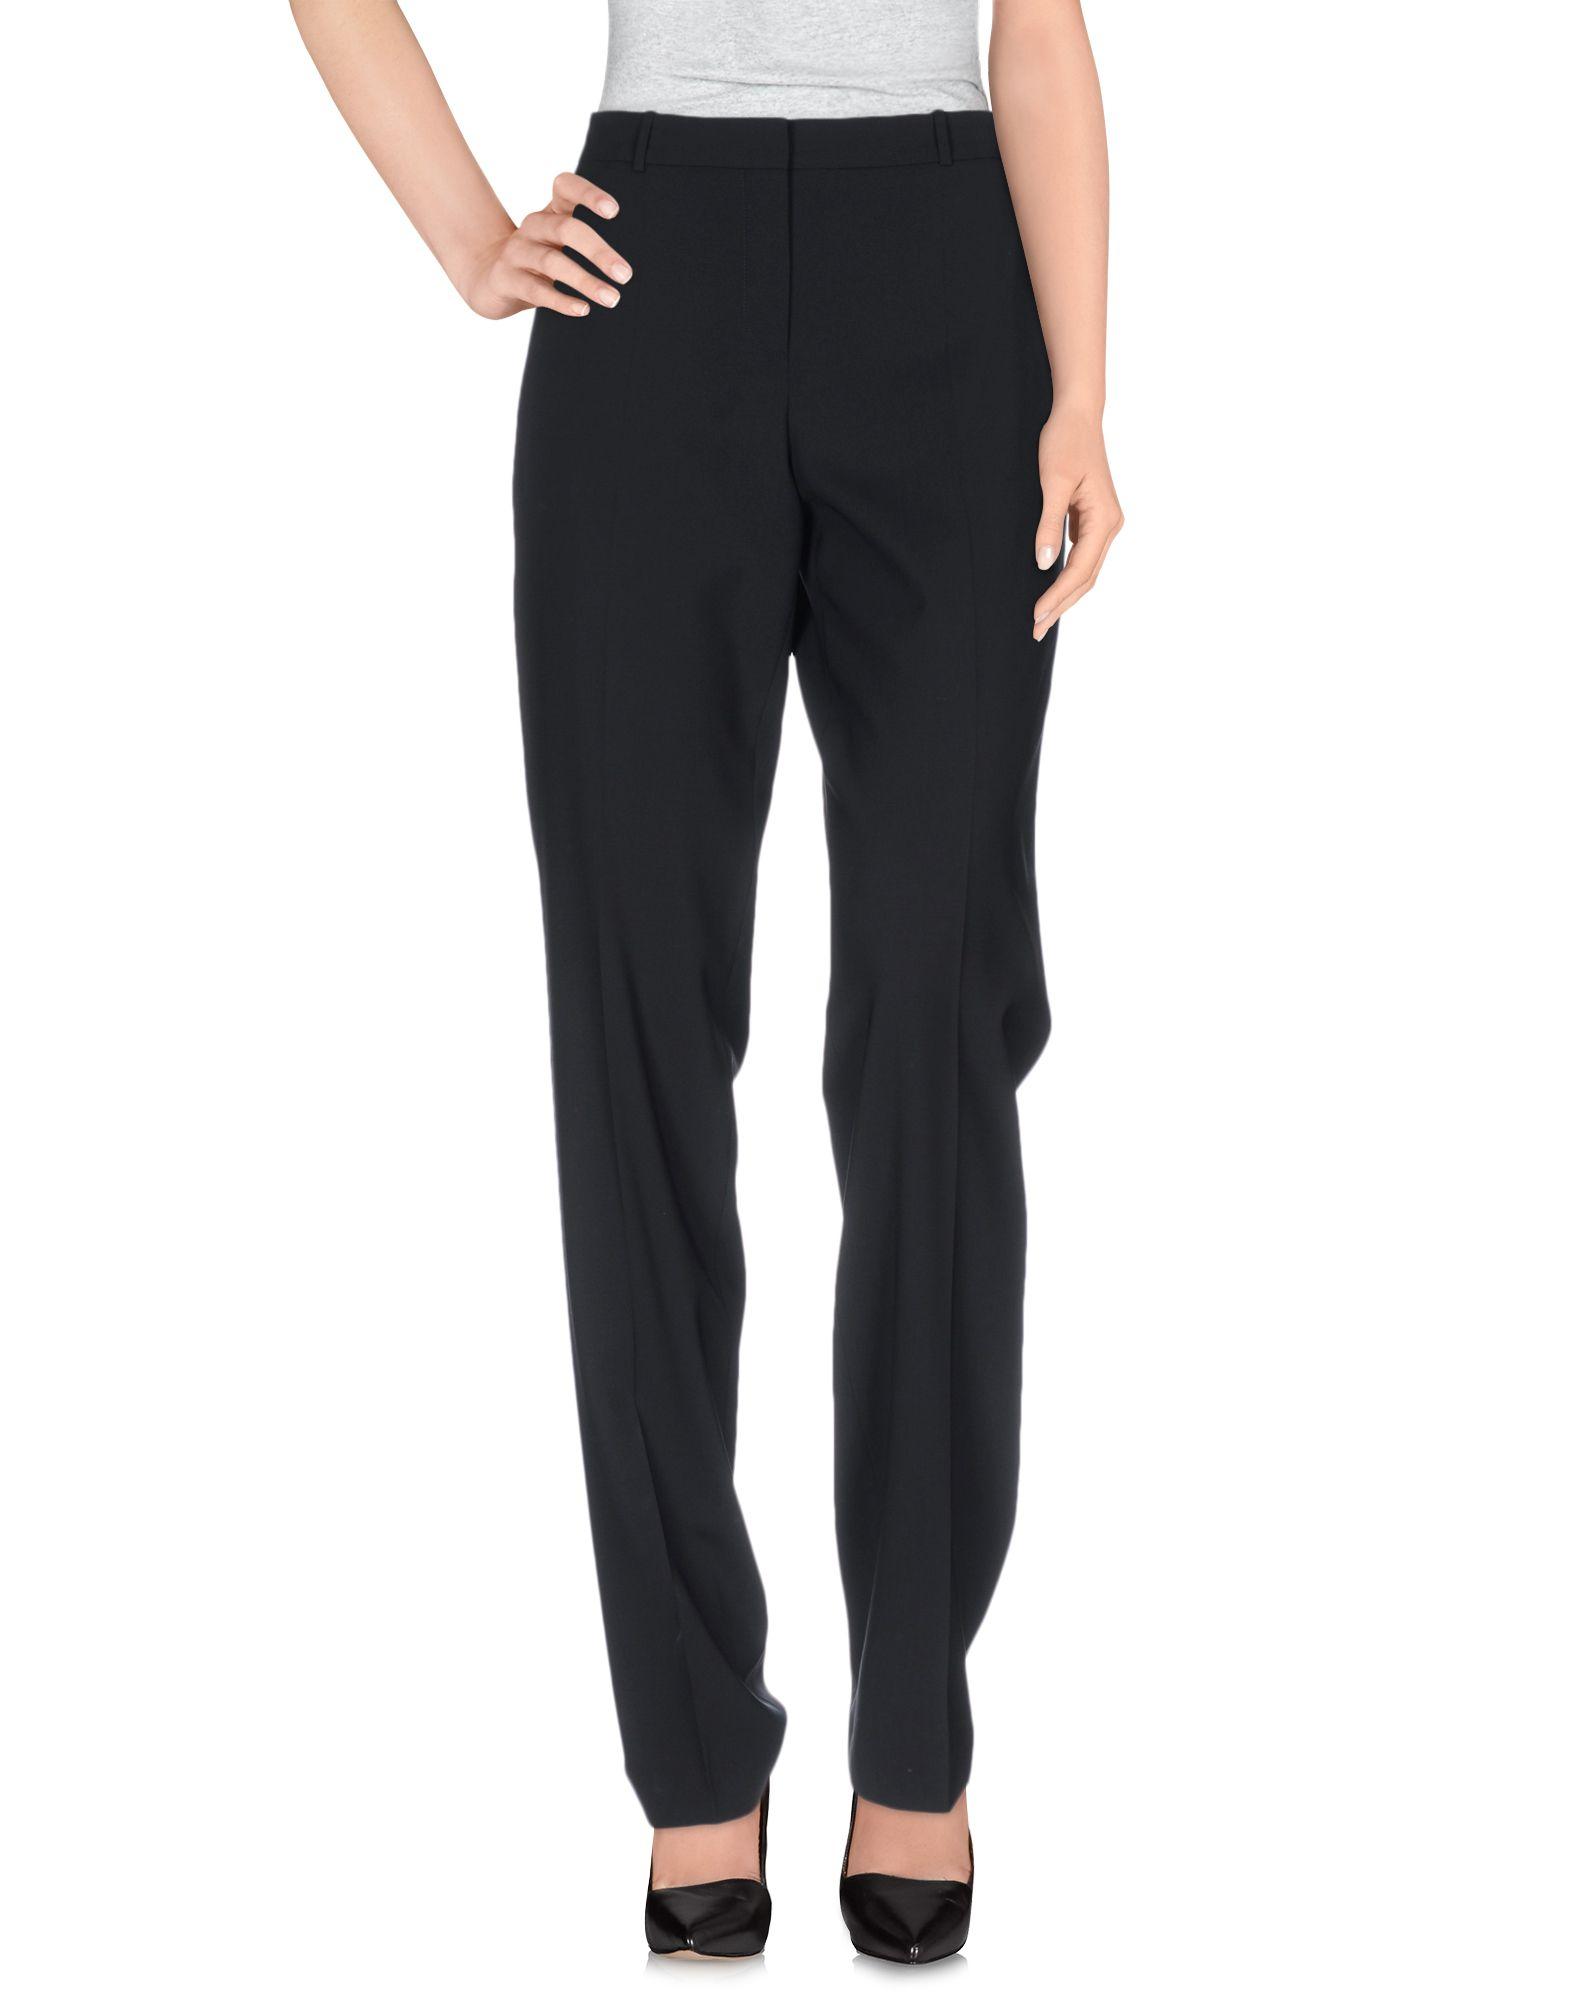 Pantalone Boss Black Donna - Acquista online su ssGf8u